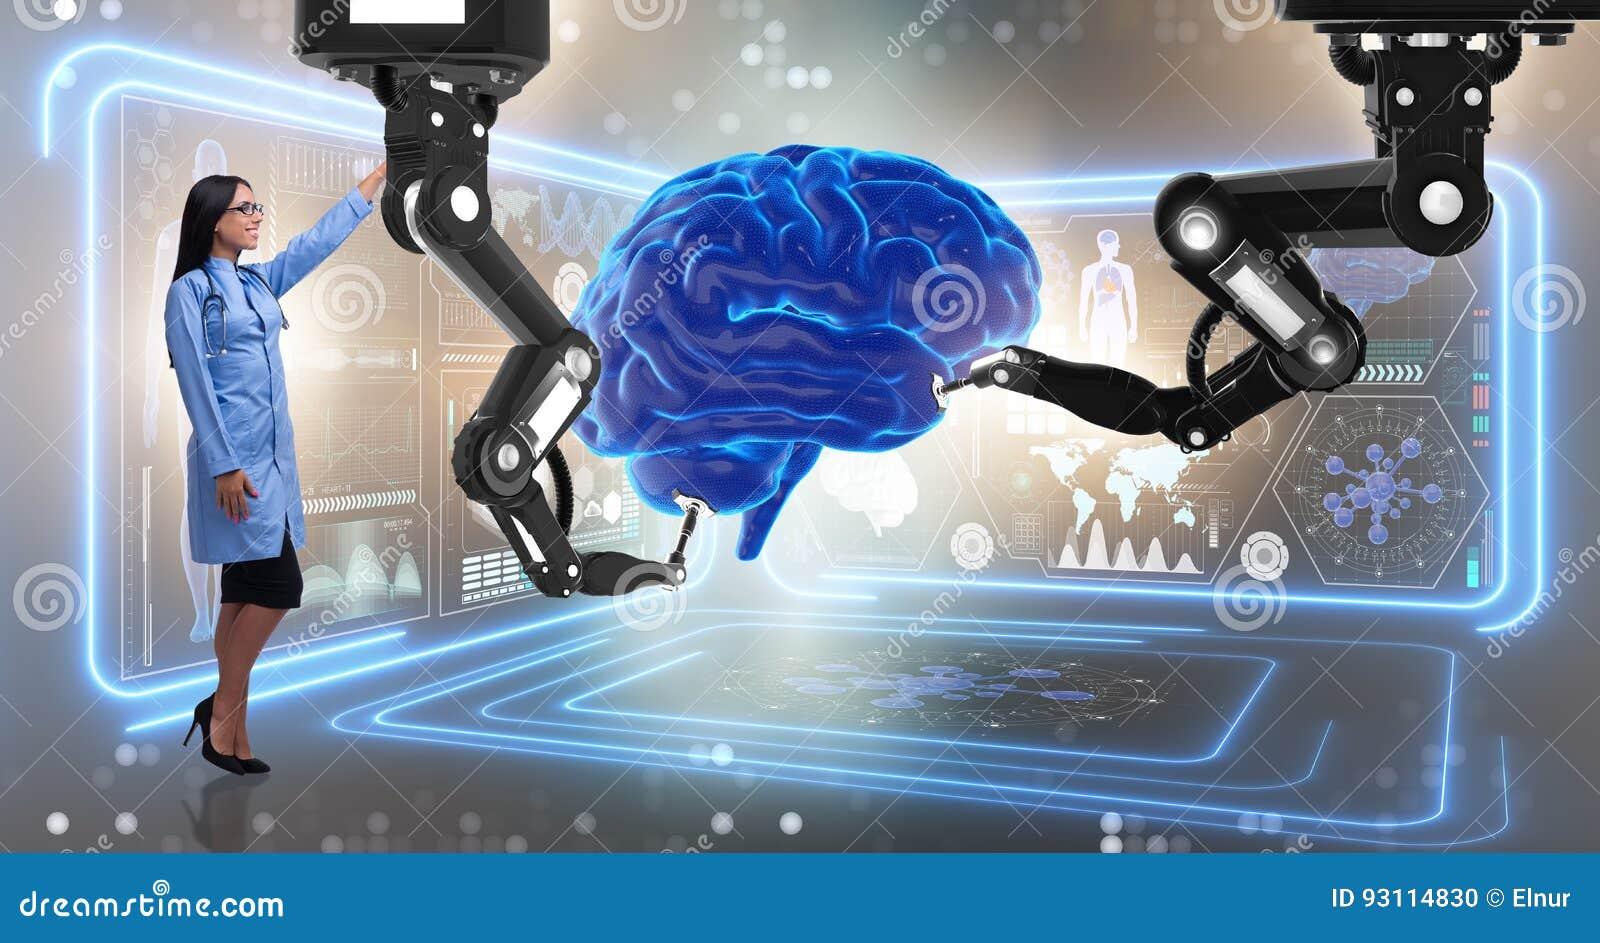 A cirurgia de cérebro feita pelo braço robótico